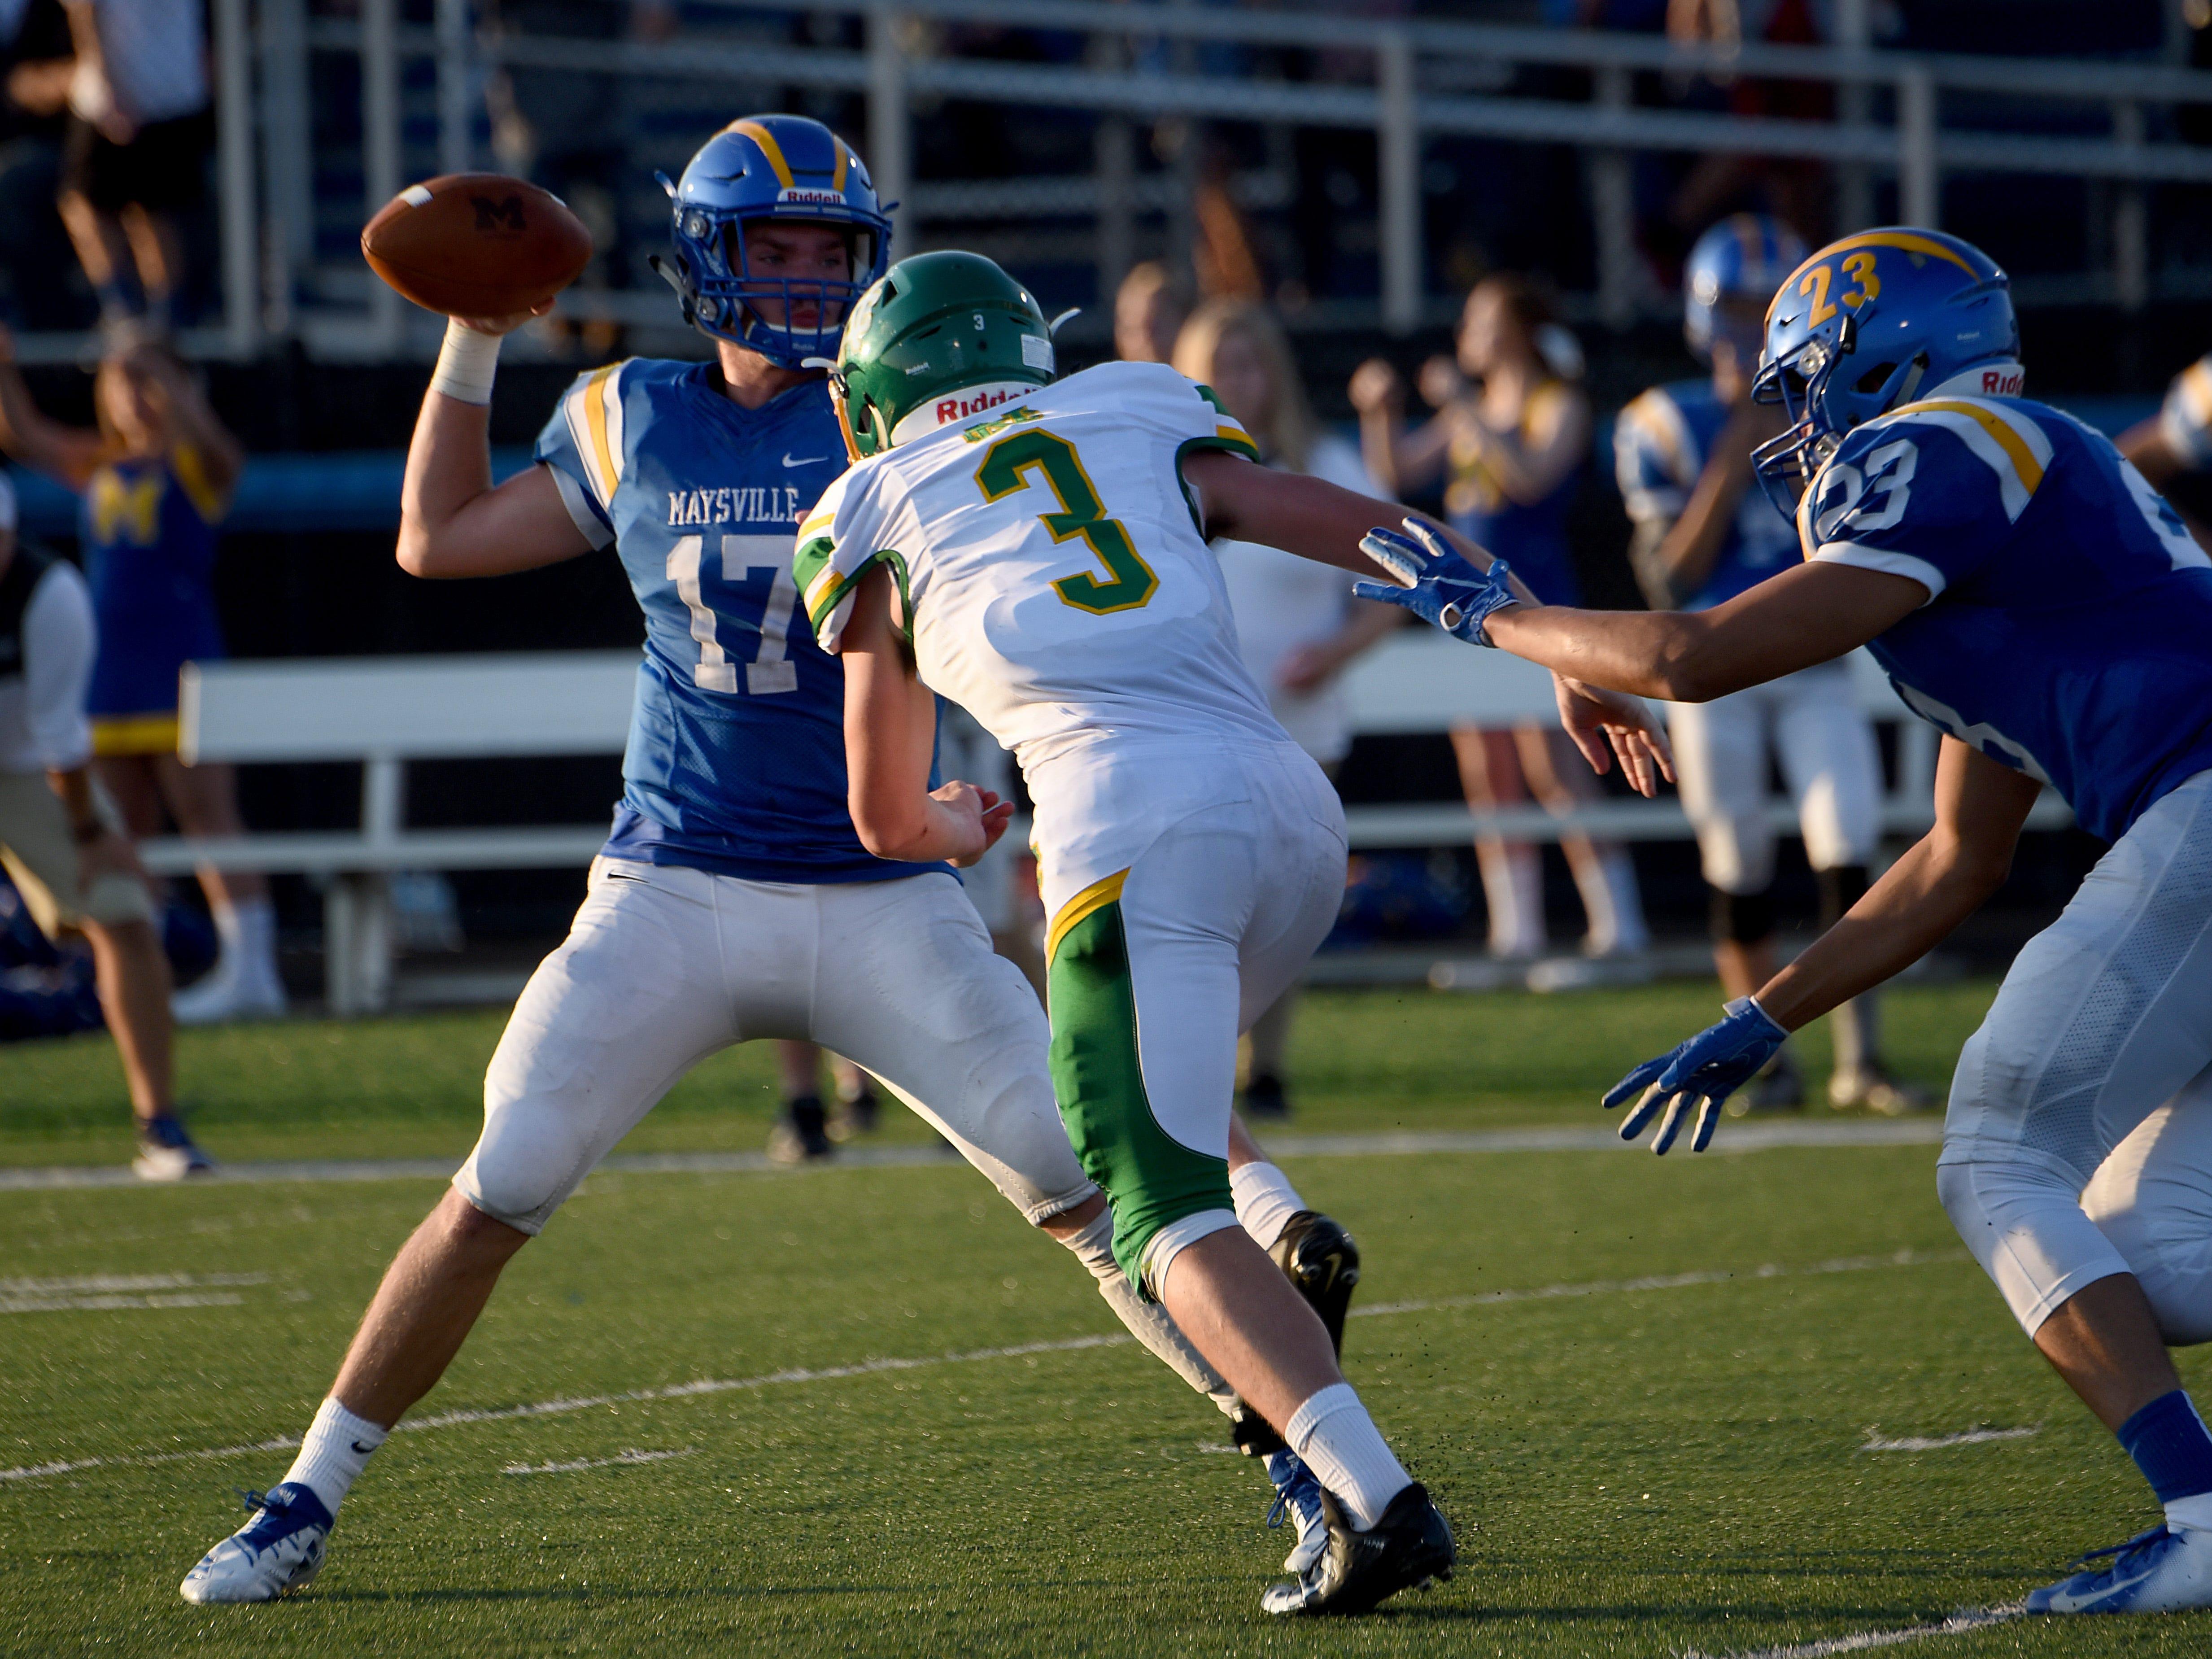 Newark Catholic senior Avery Stutz pressures Maysville quarterback Cole Tompkins during the Green Wave's 17-13 season-opening win.